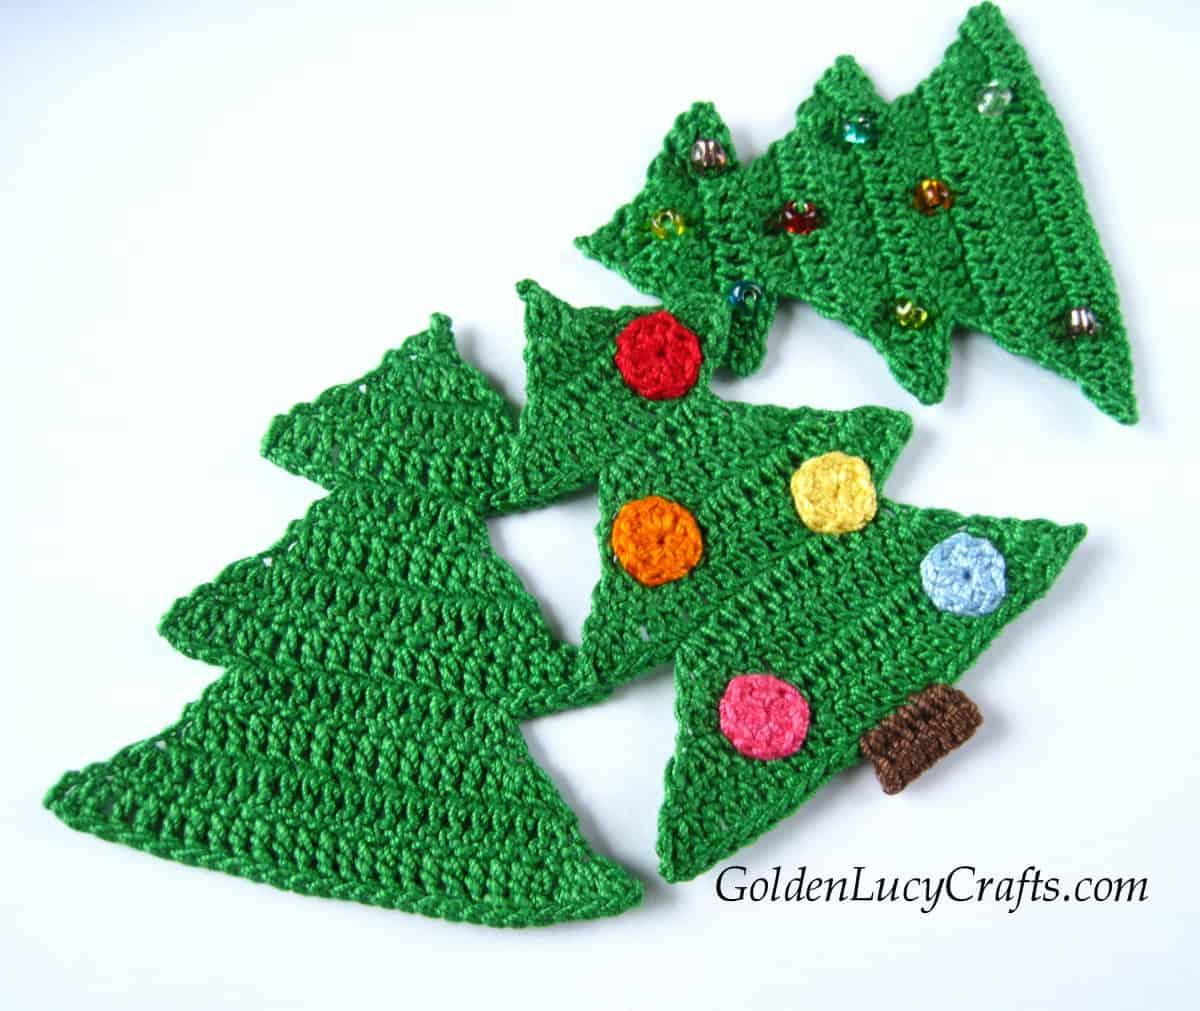 Three green crocheted Christmas tree appliques.